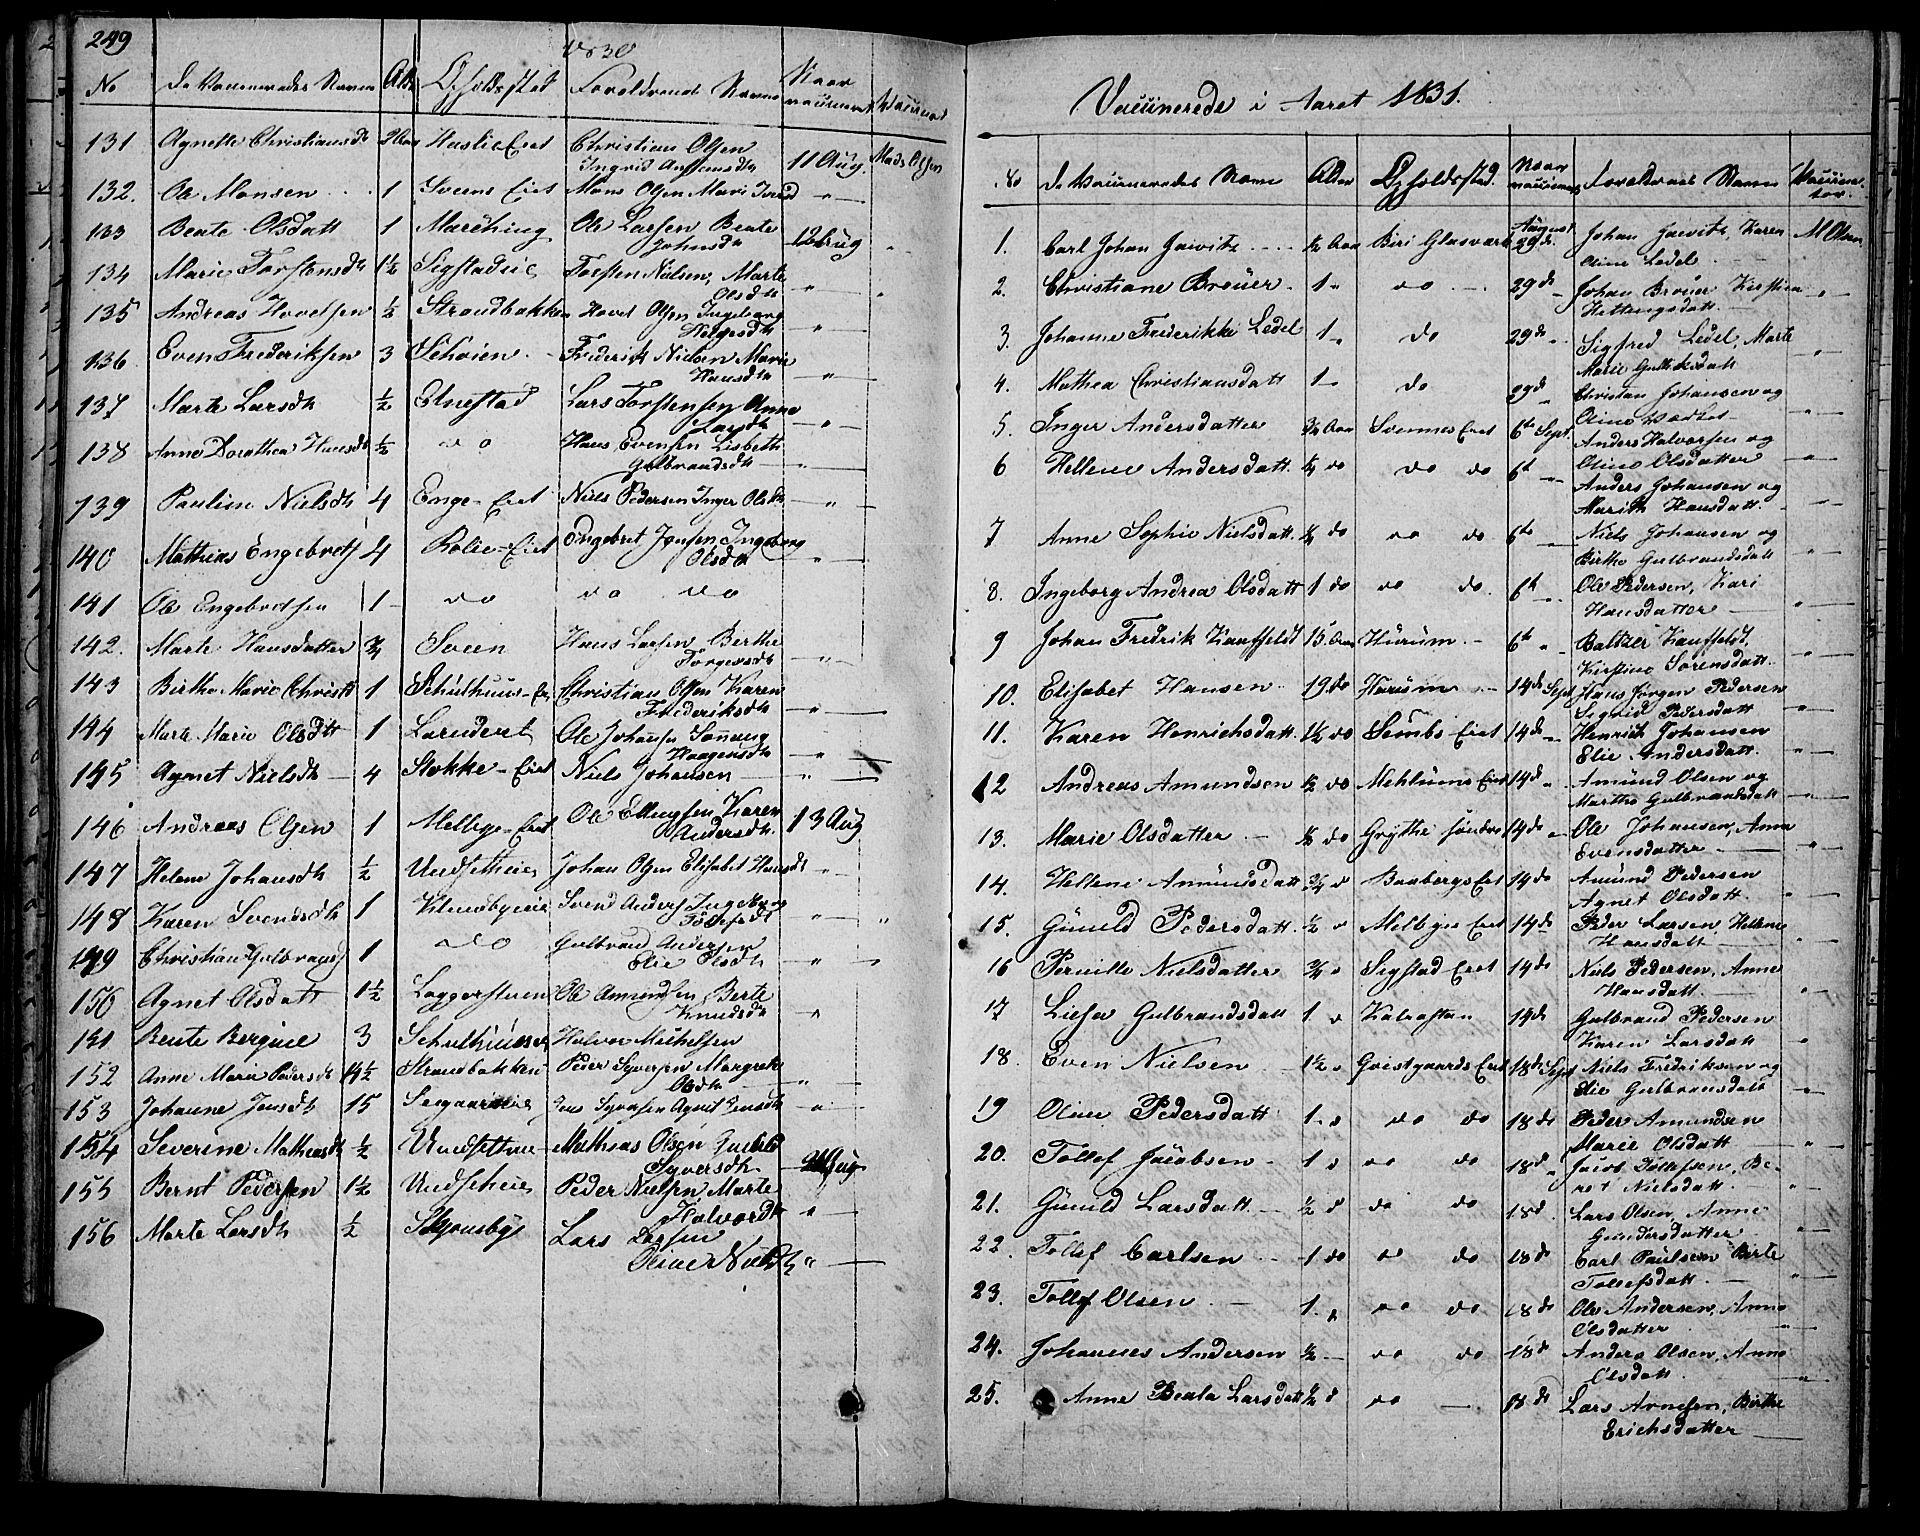 SAH, Biri prestekontor, Ministerialbok nr. 4, 1829-1842, s. 249